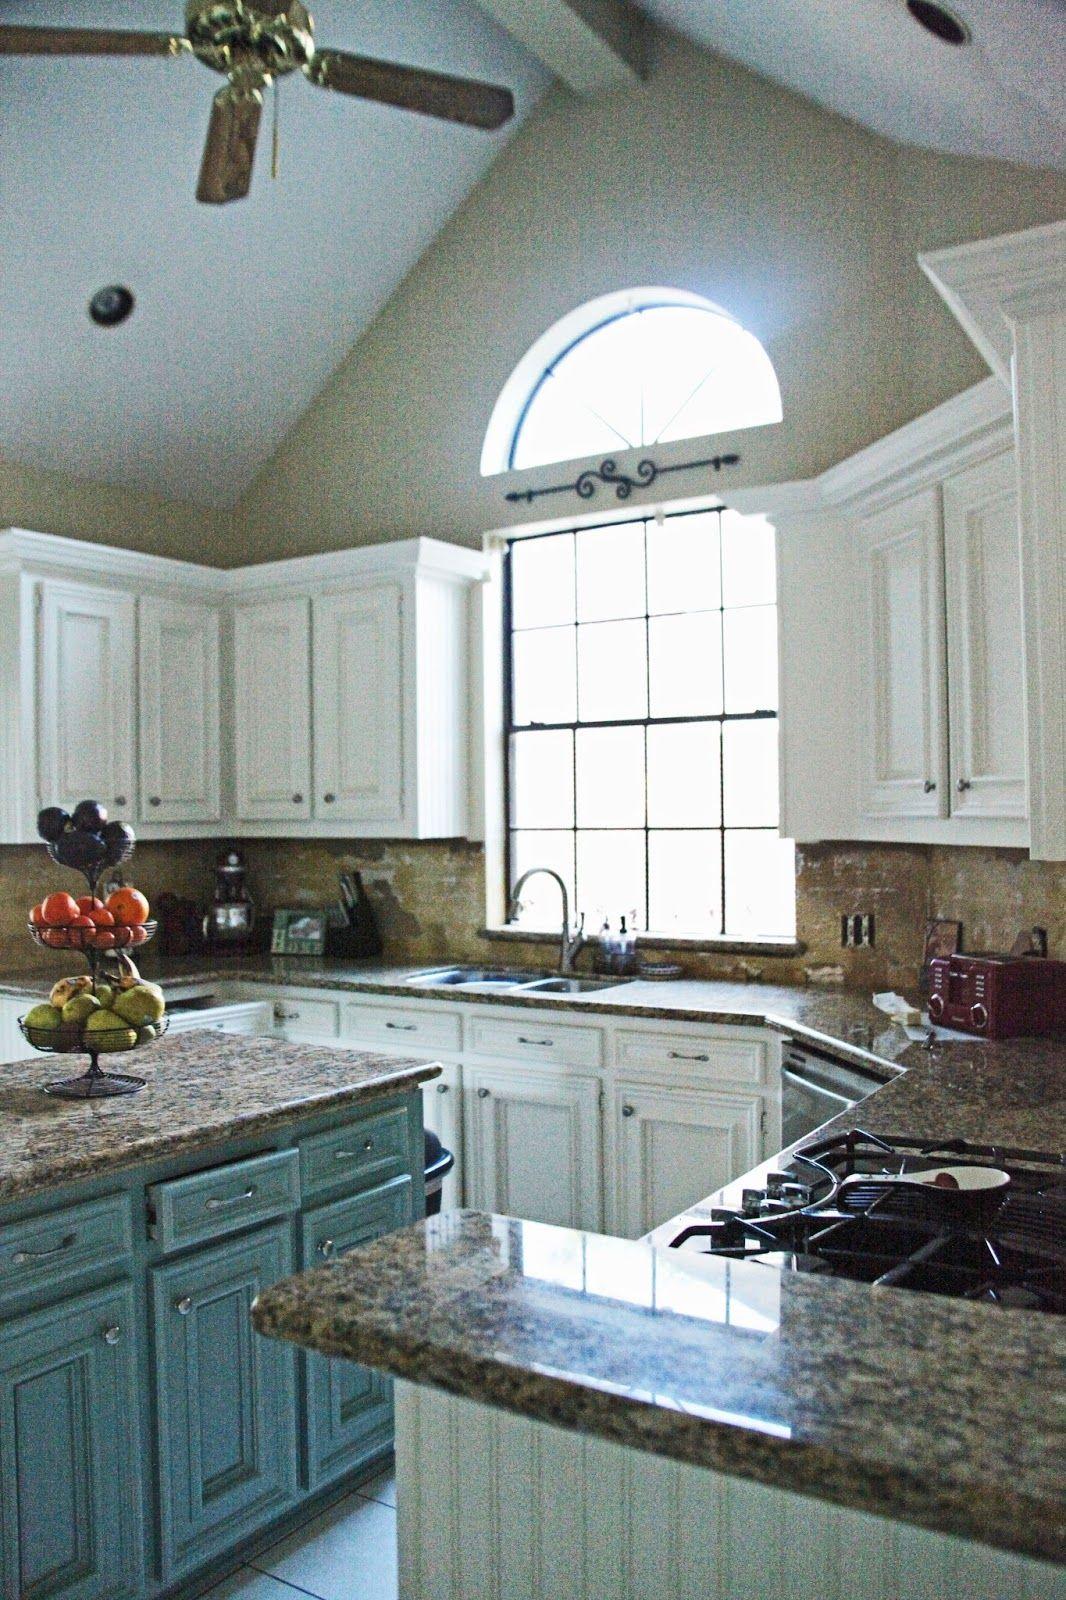 Cbid home decor and design houston remodel kitchen love